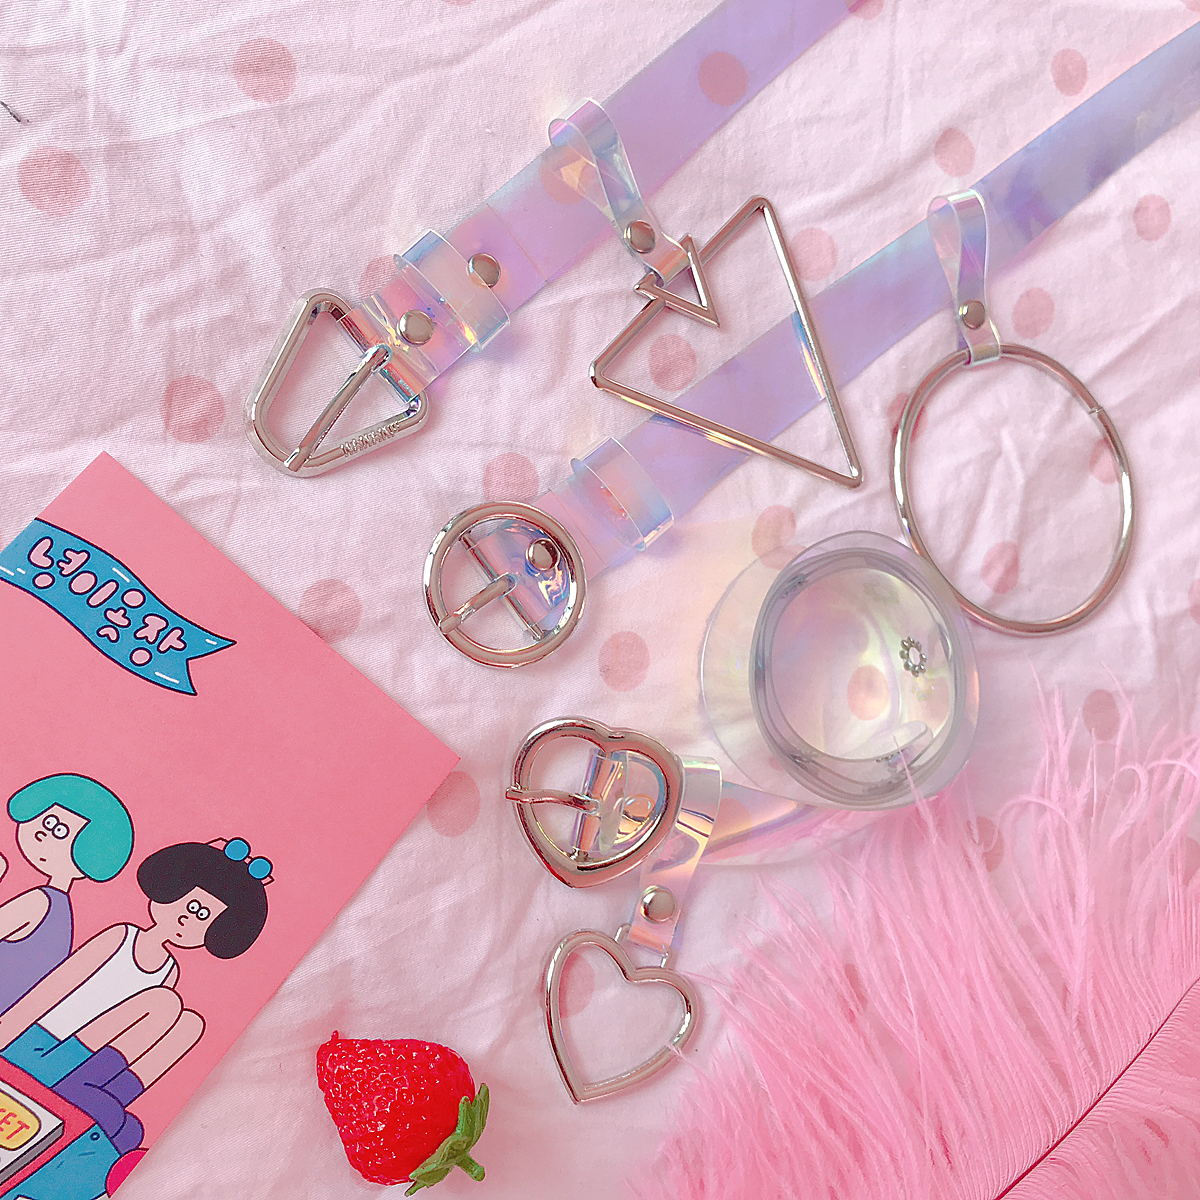 Kawaii Candy Color Heart Laser Belt Clear PVC Chic Aesthetic Love Harajuku Waistband